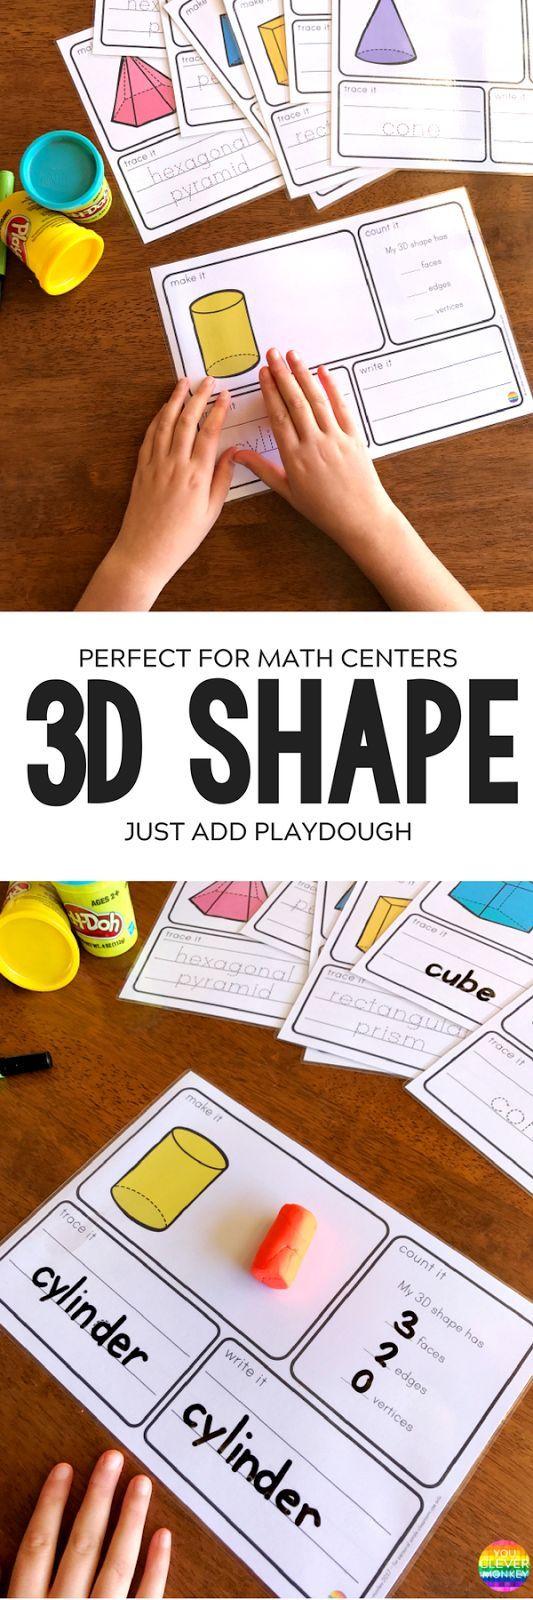 3D Shape Printable Playdough Mats   you clever monkey